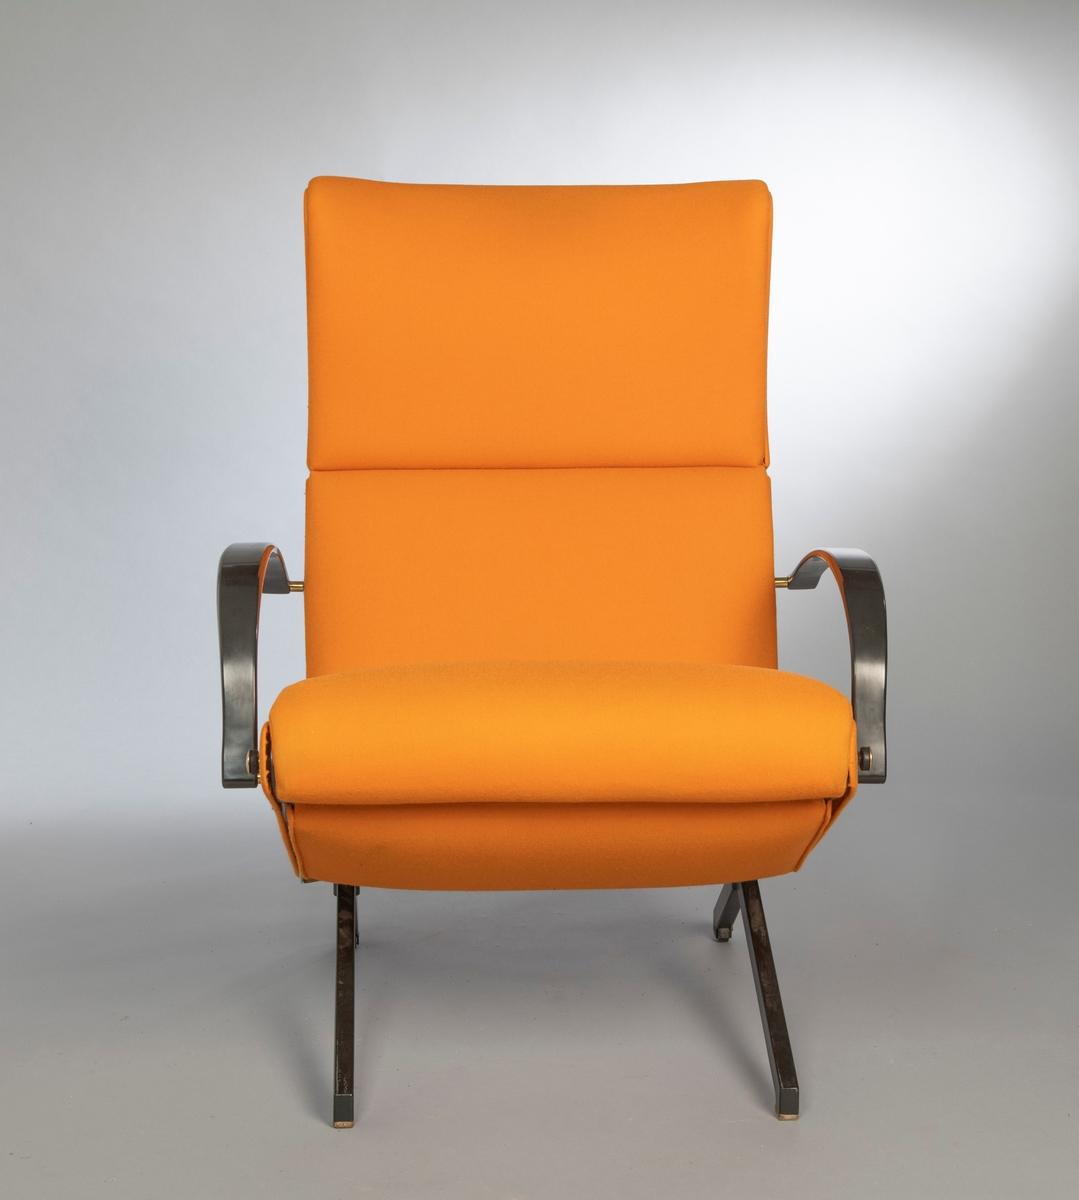 Borsani P40 lounge chair [Lenestol]